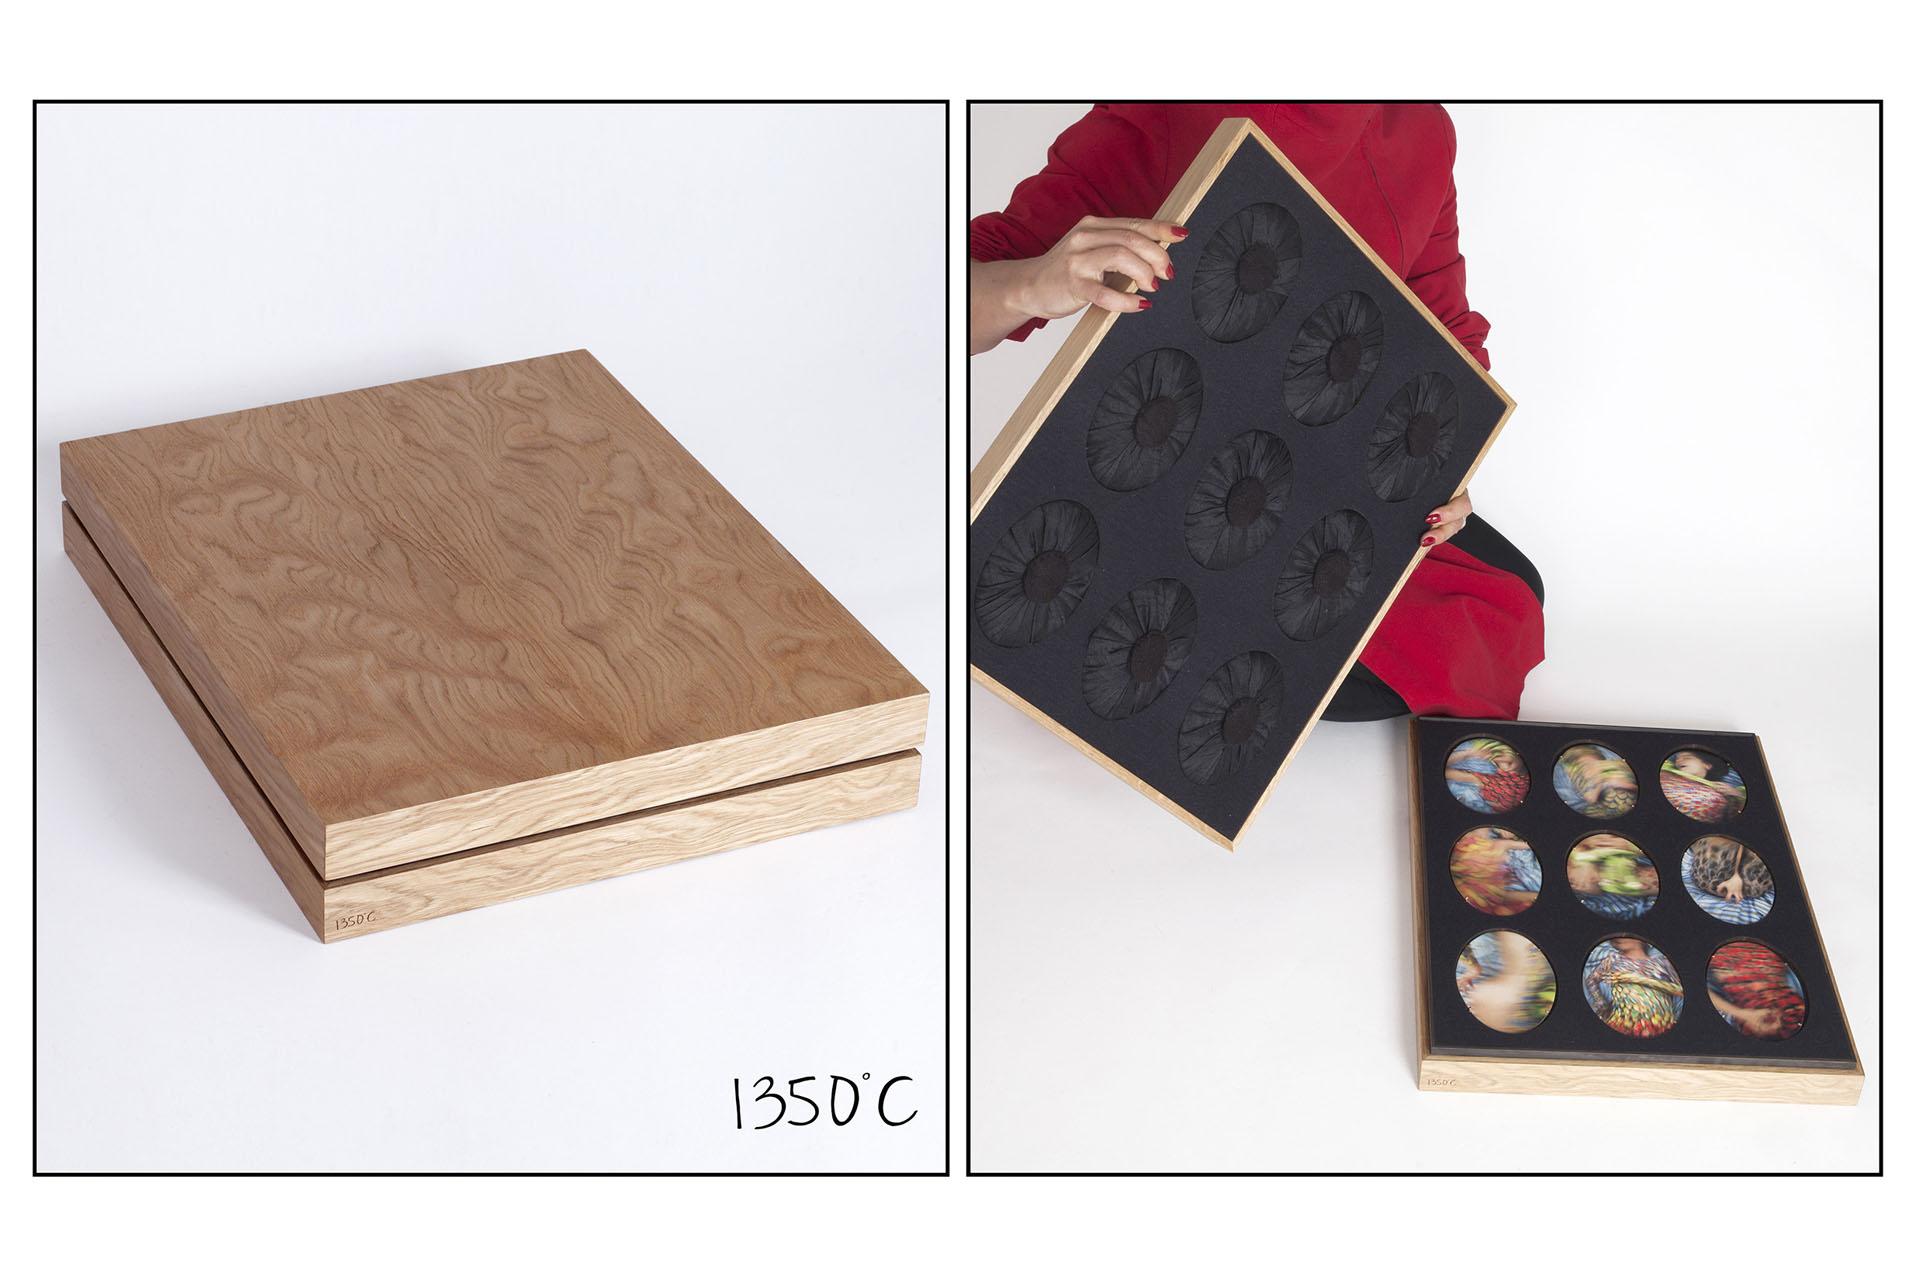 1 - 1350°C - Objet d'Art